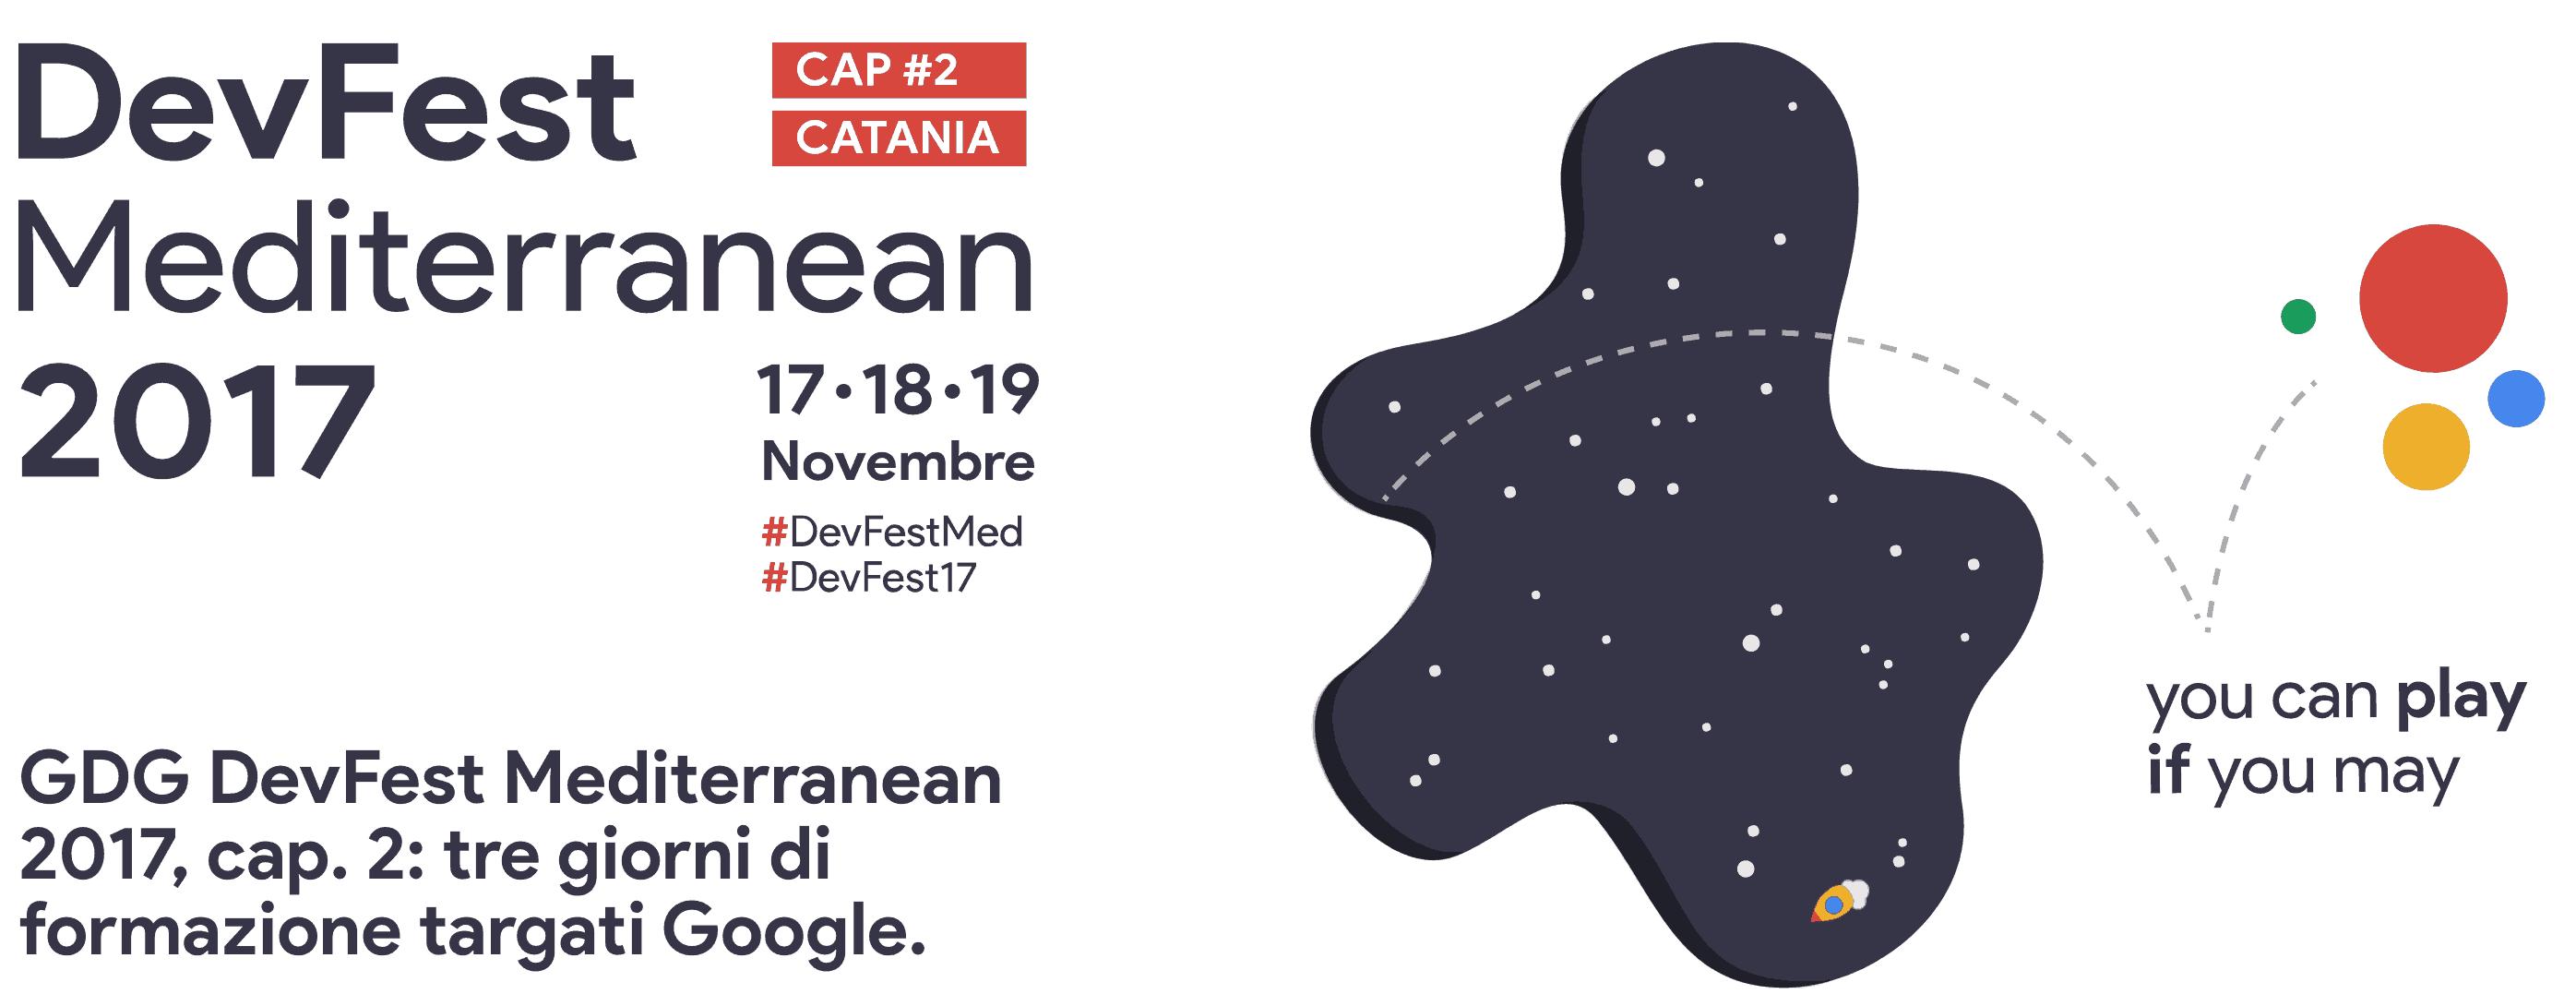 GDG DevFest Mediterranean 2017 cap. 2